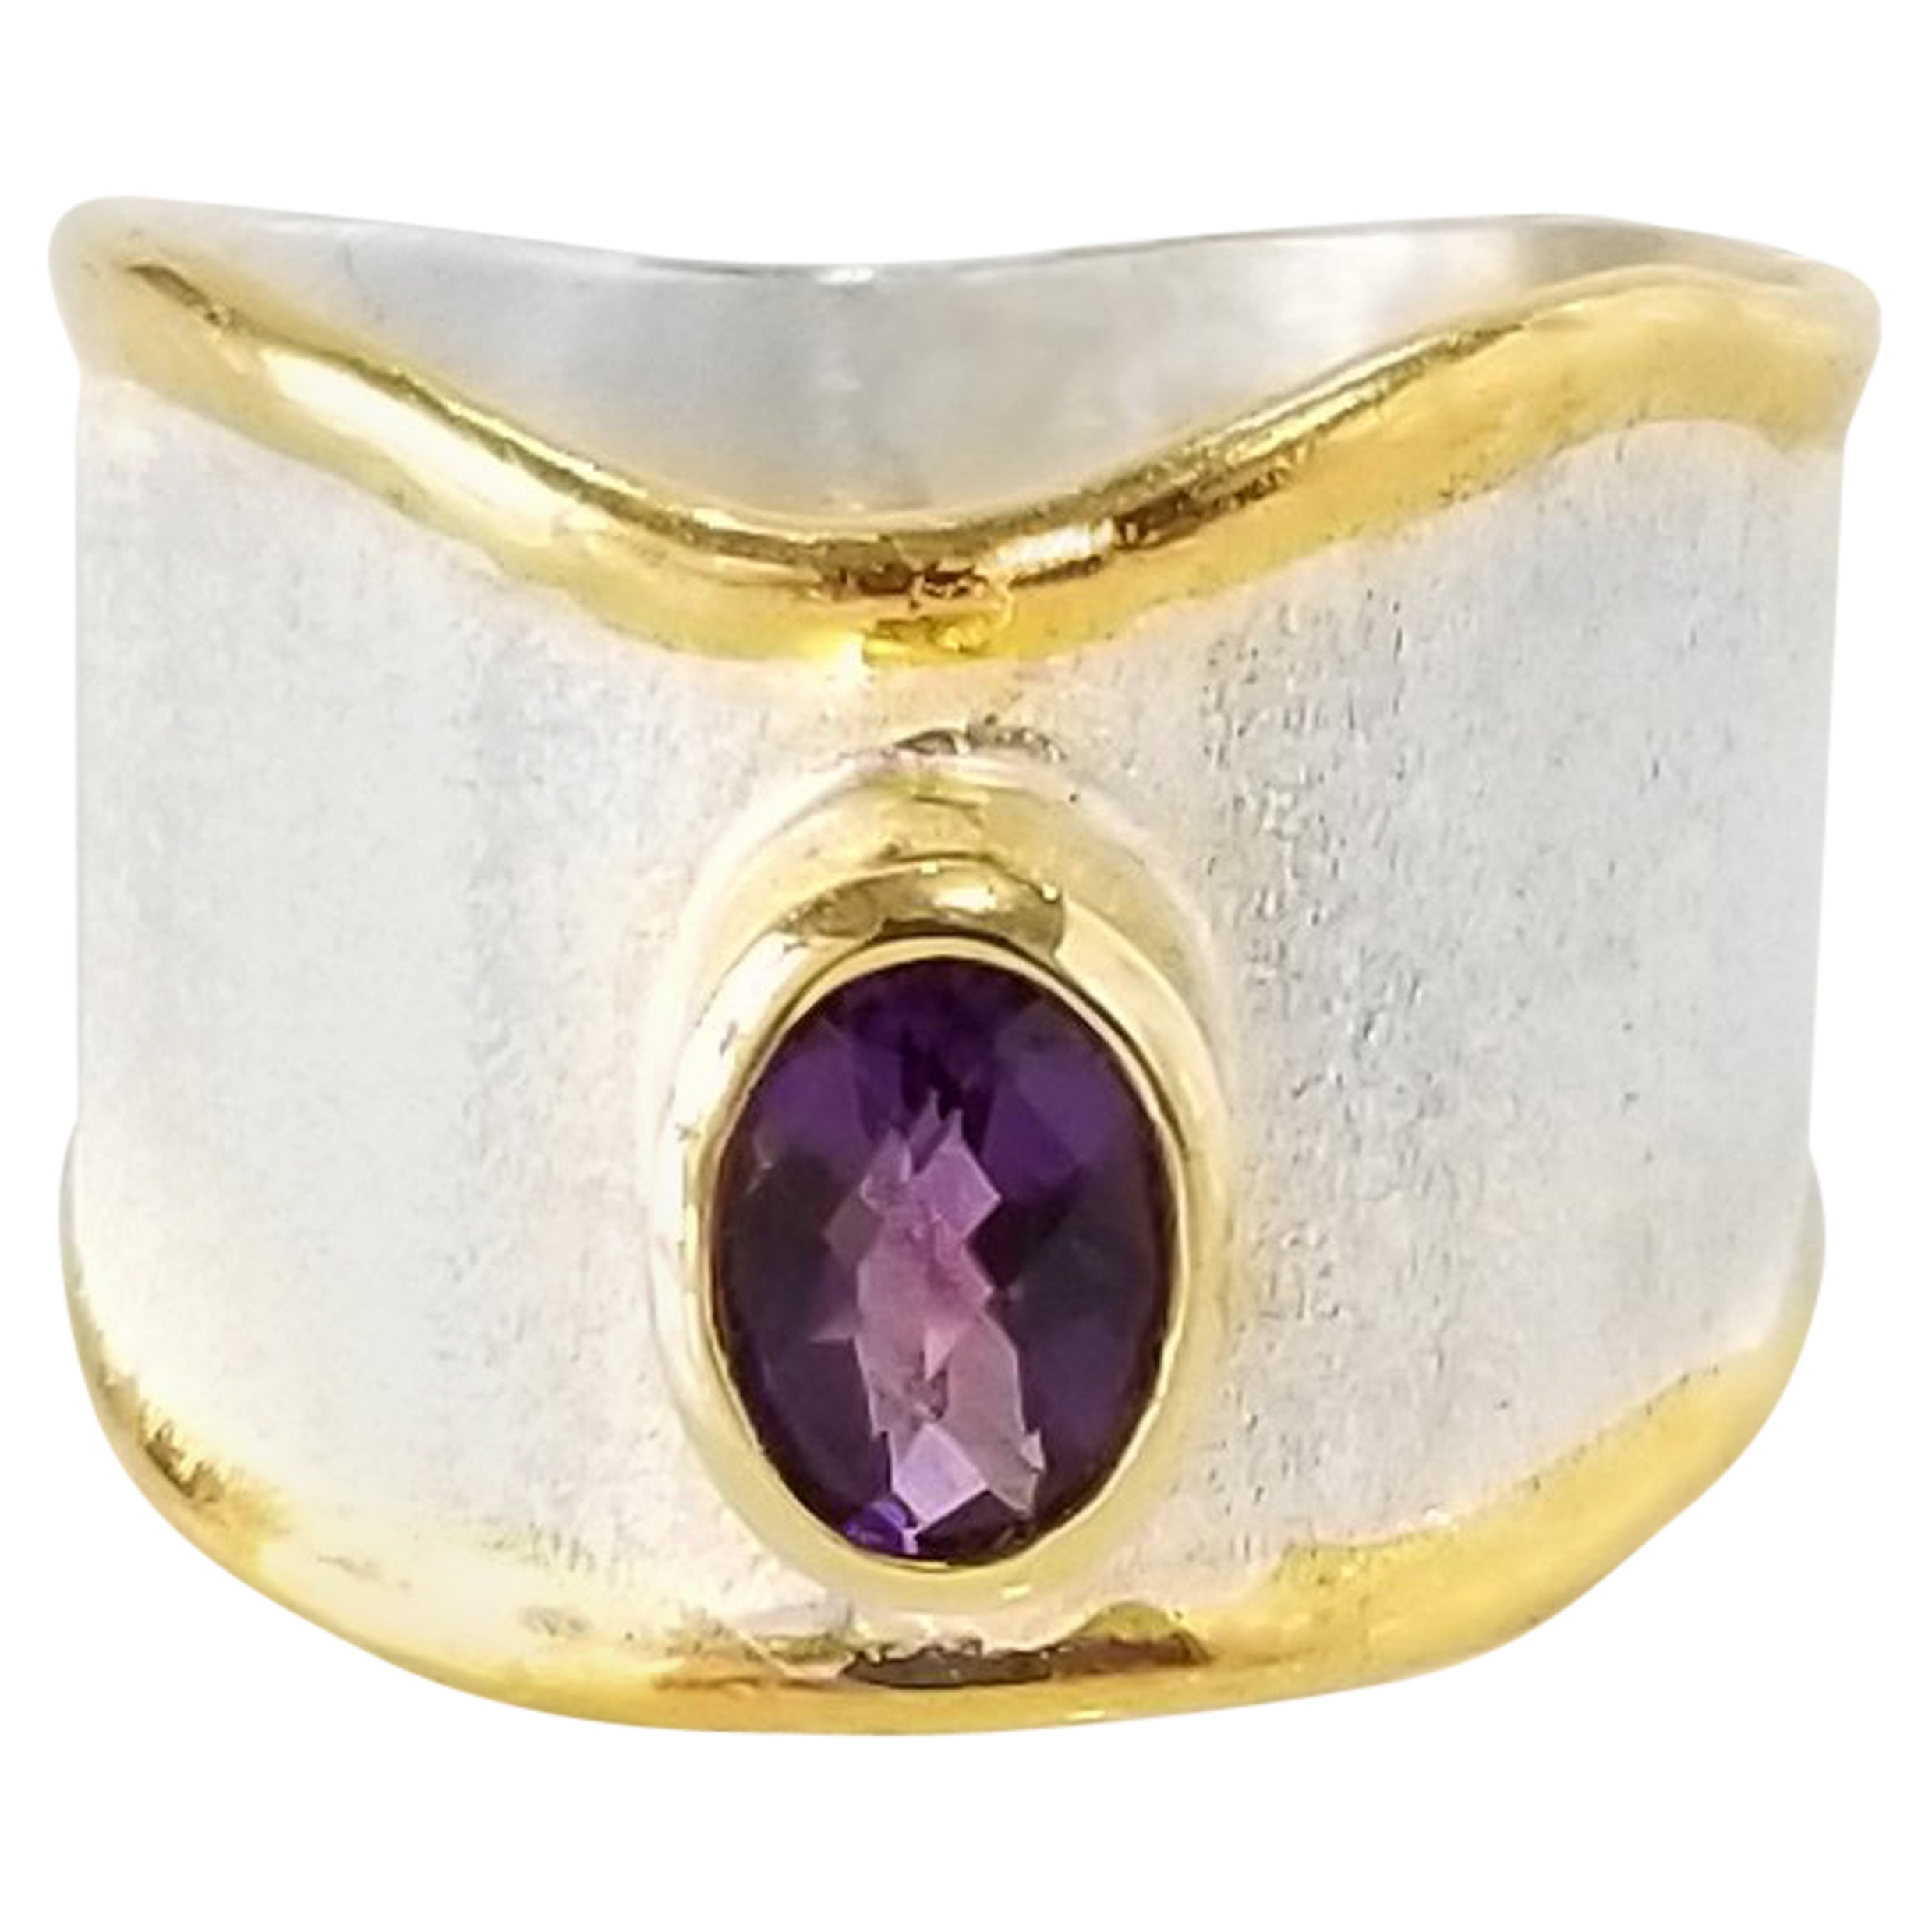 Yianni Creations 0.85 Carat Amethyst Fine Silver and 24 Karat Gold Artisan Ring